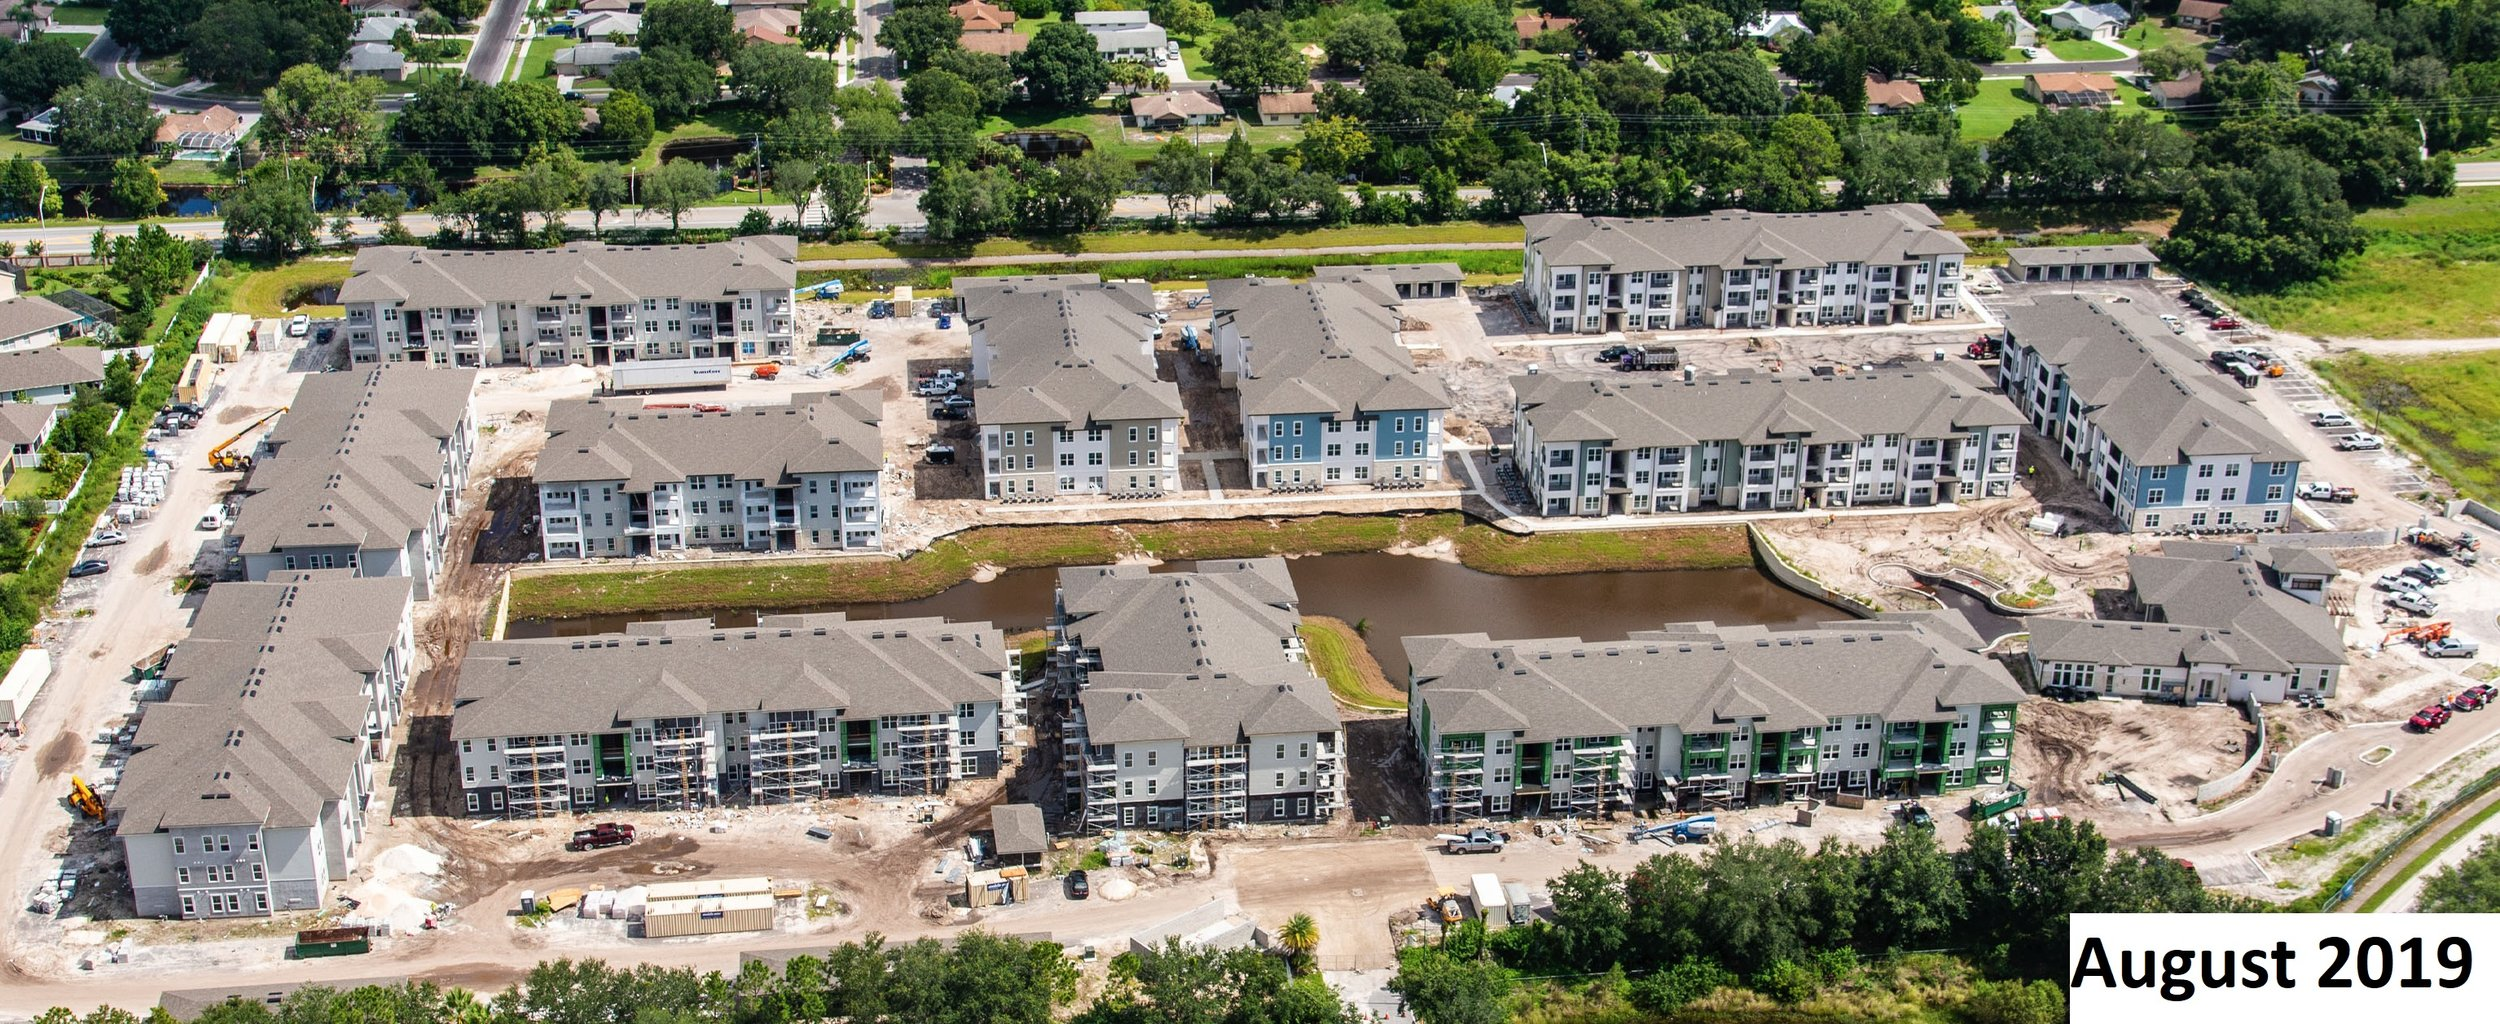 Sarasota Aug 2019.jpg